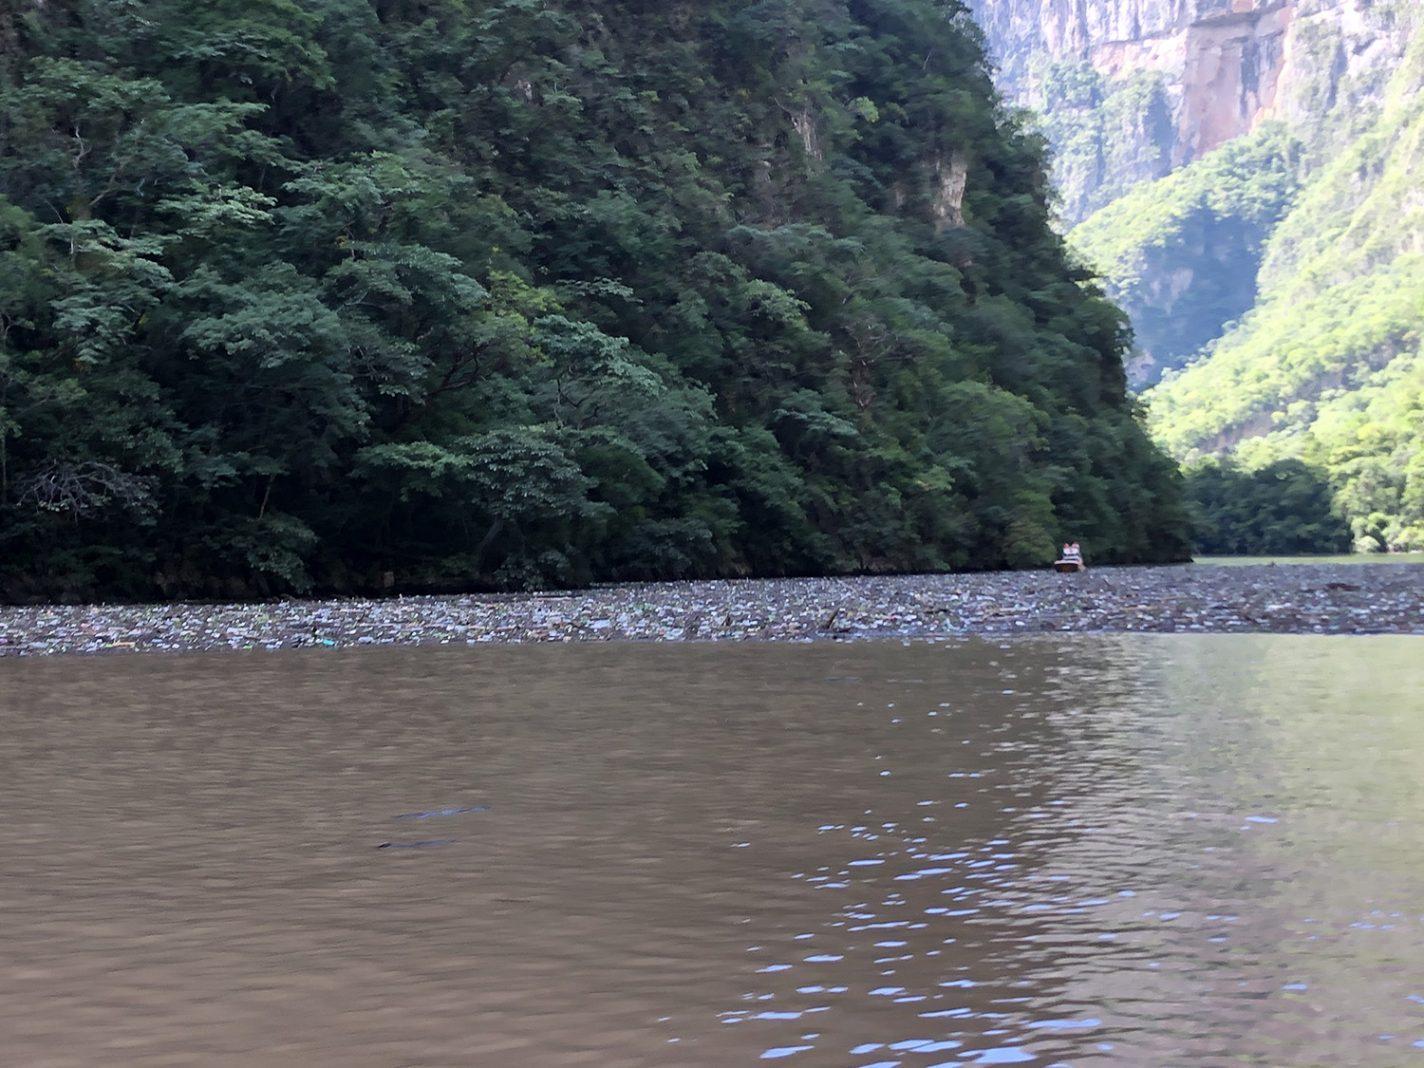 Veel afval in het water - Chiapas in Zuid-Mexico